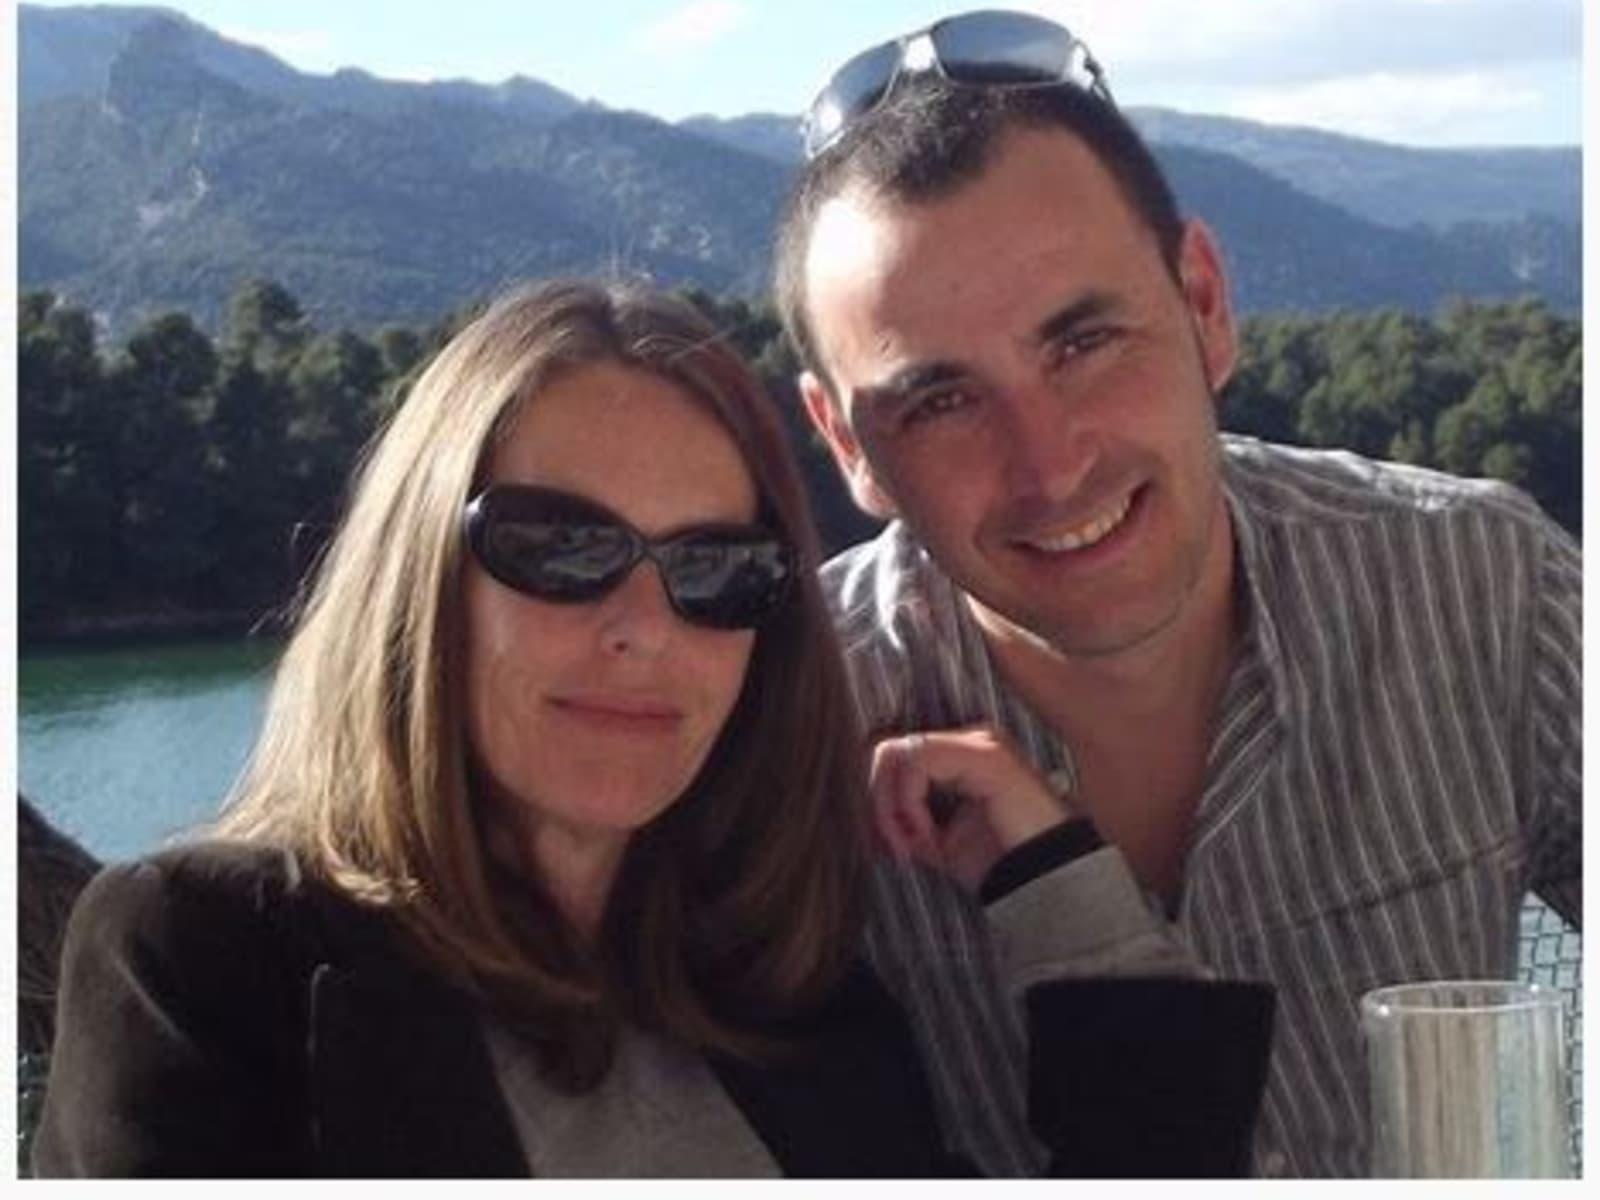 Chris & Kerr from Granada, Spain